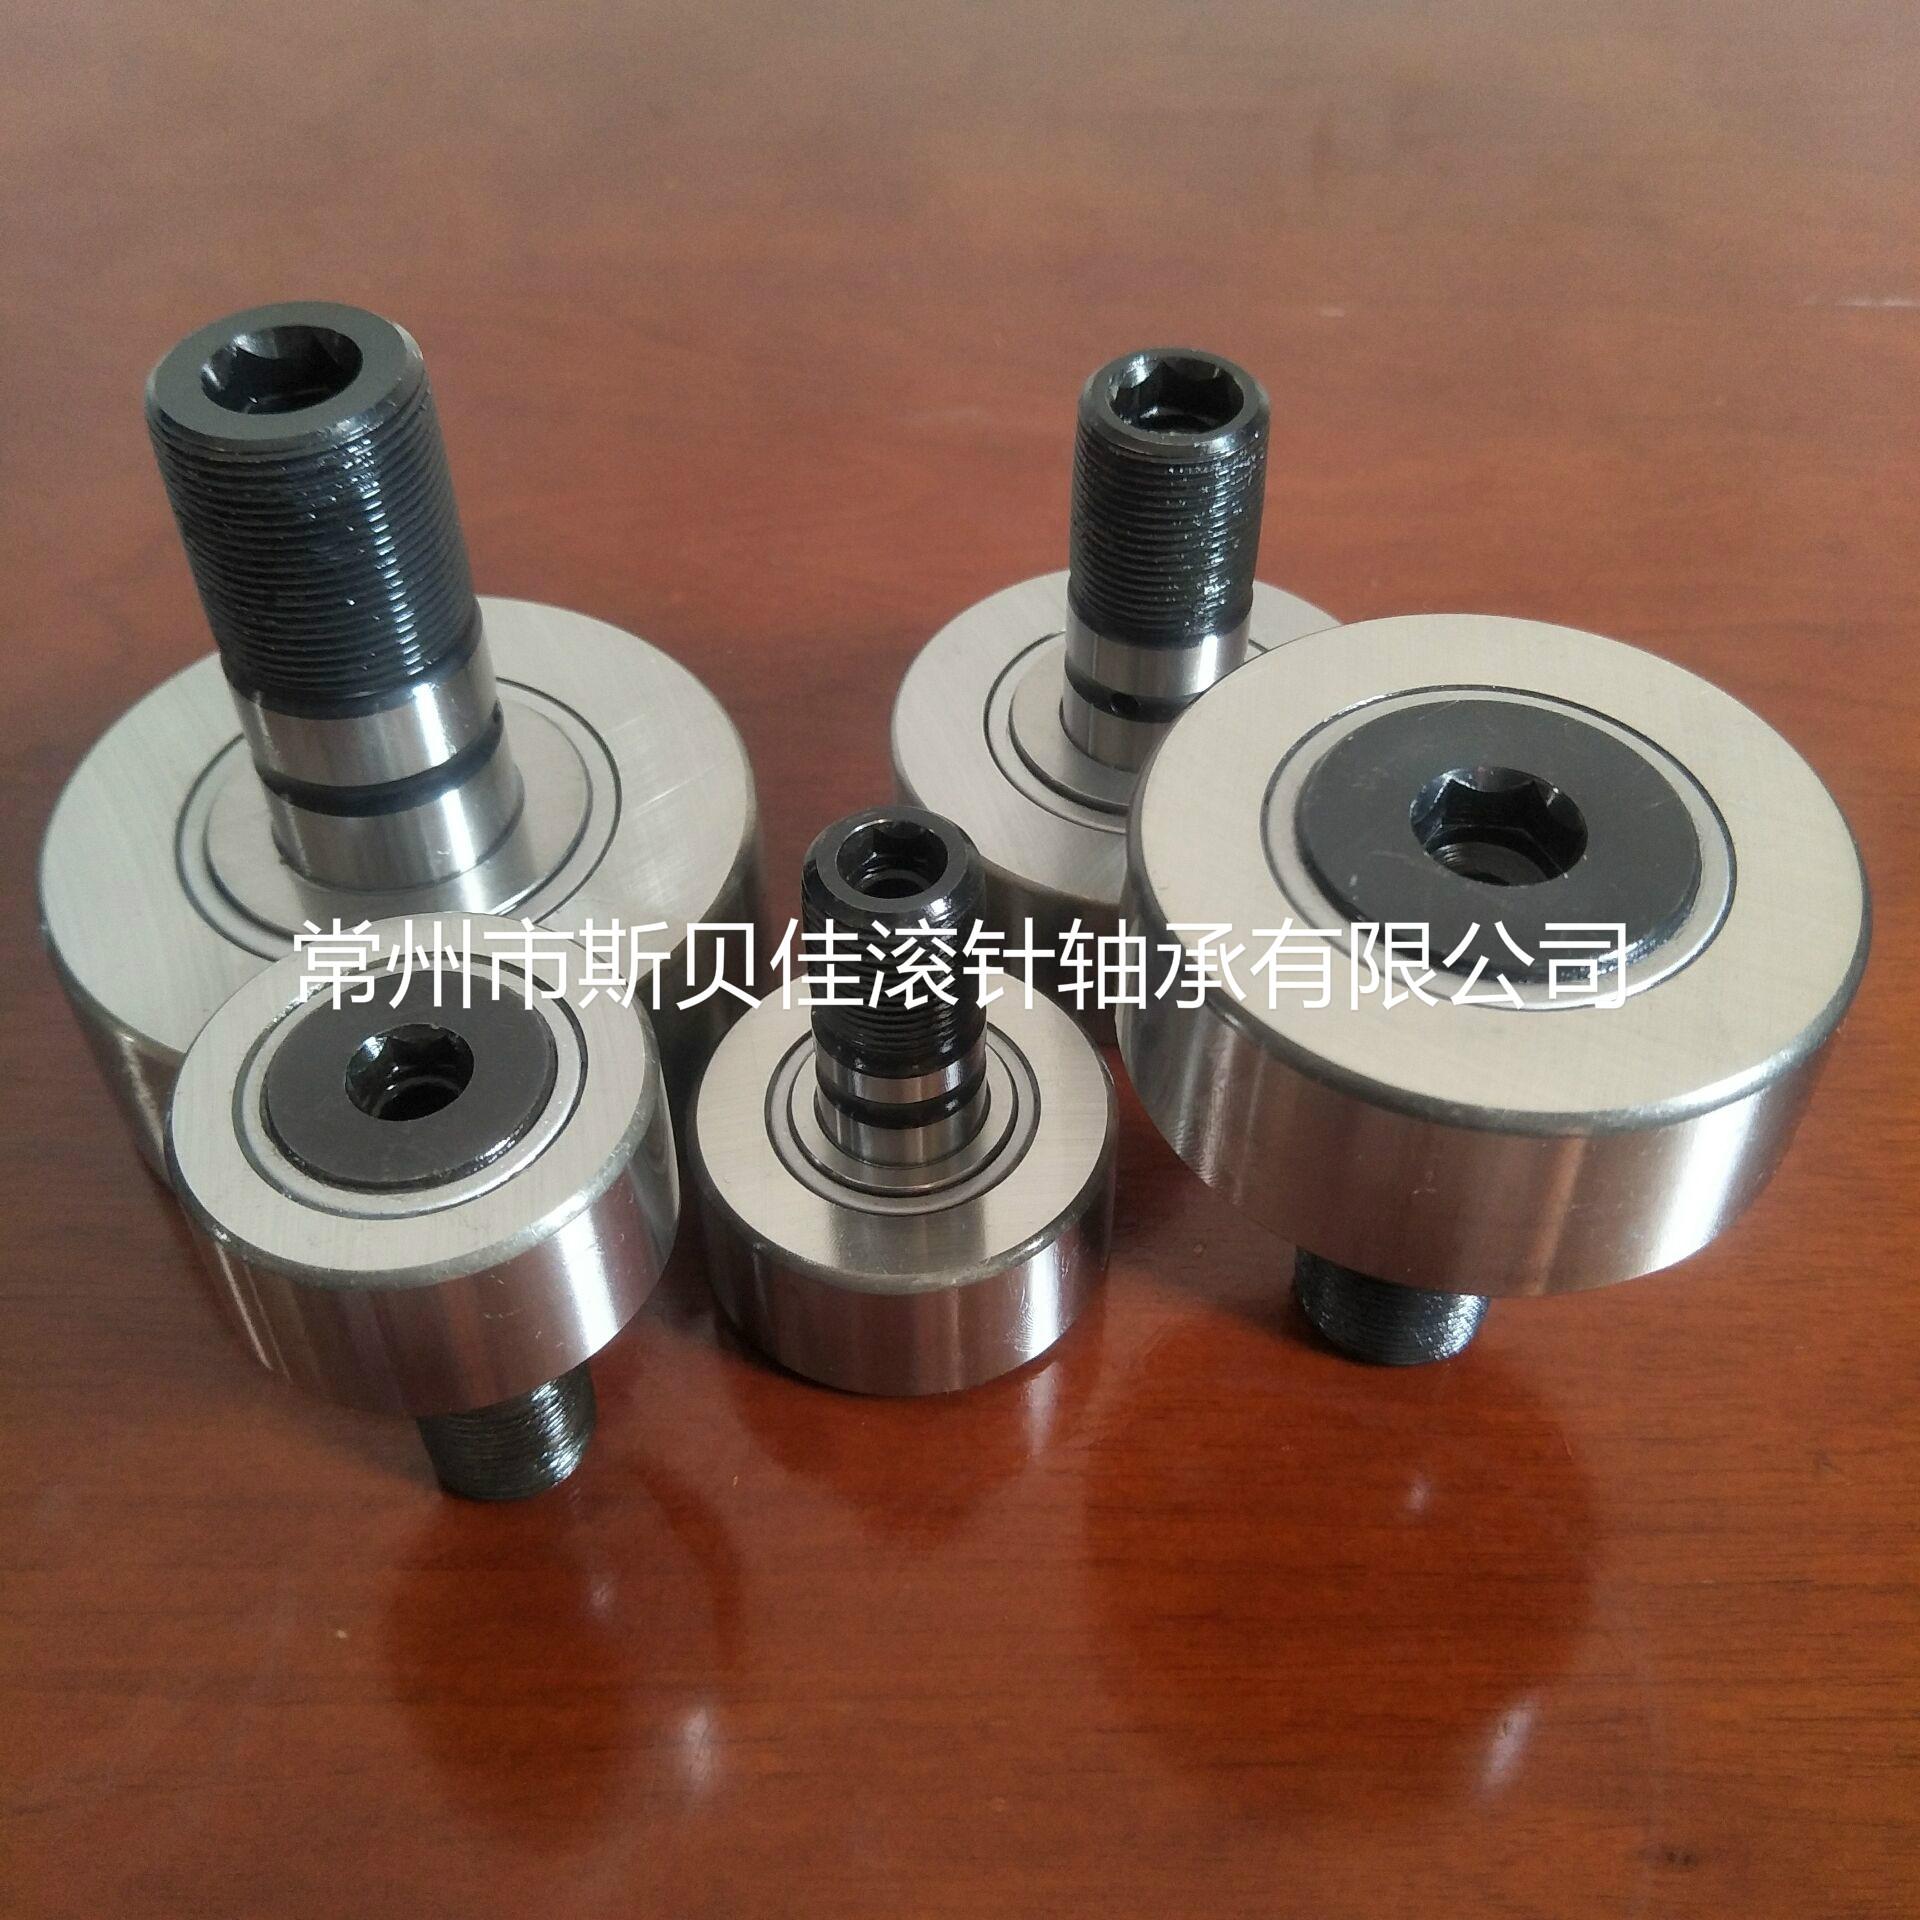 NUKR系列曲线螺栓滚轮轴承